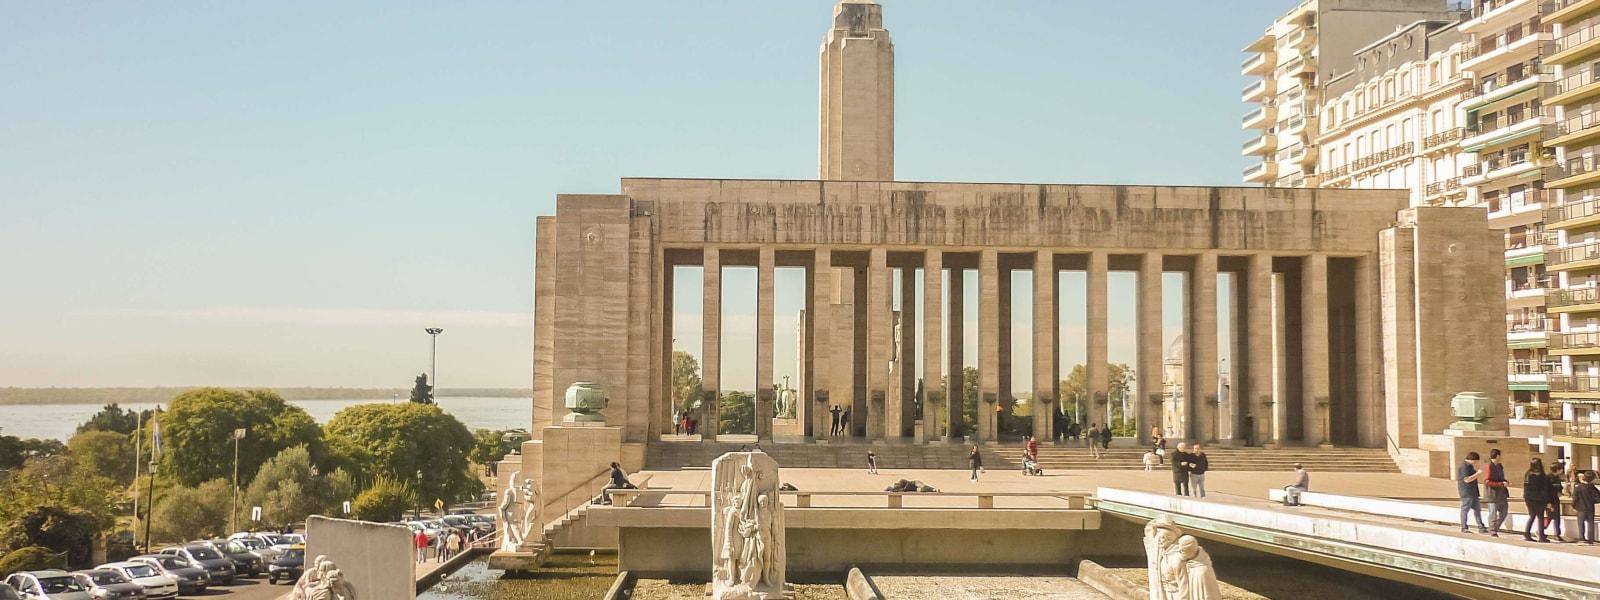 Rosario-Tour-Guide